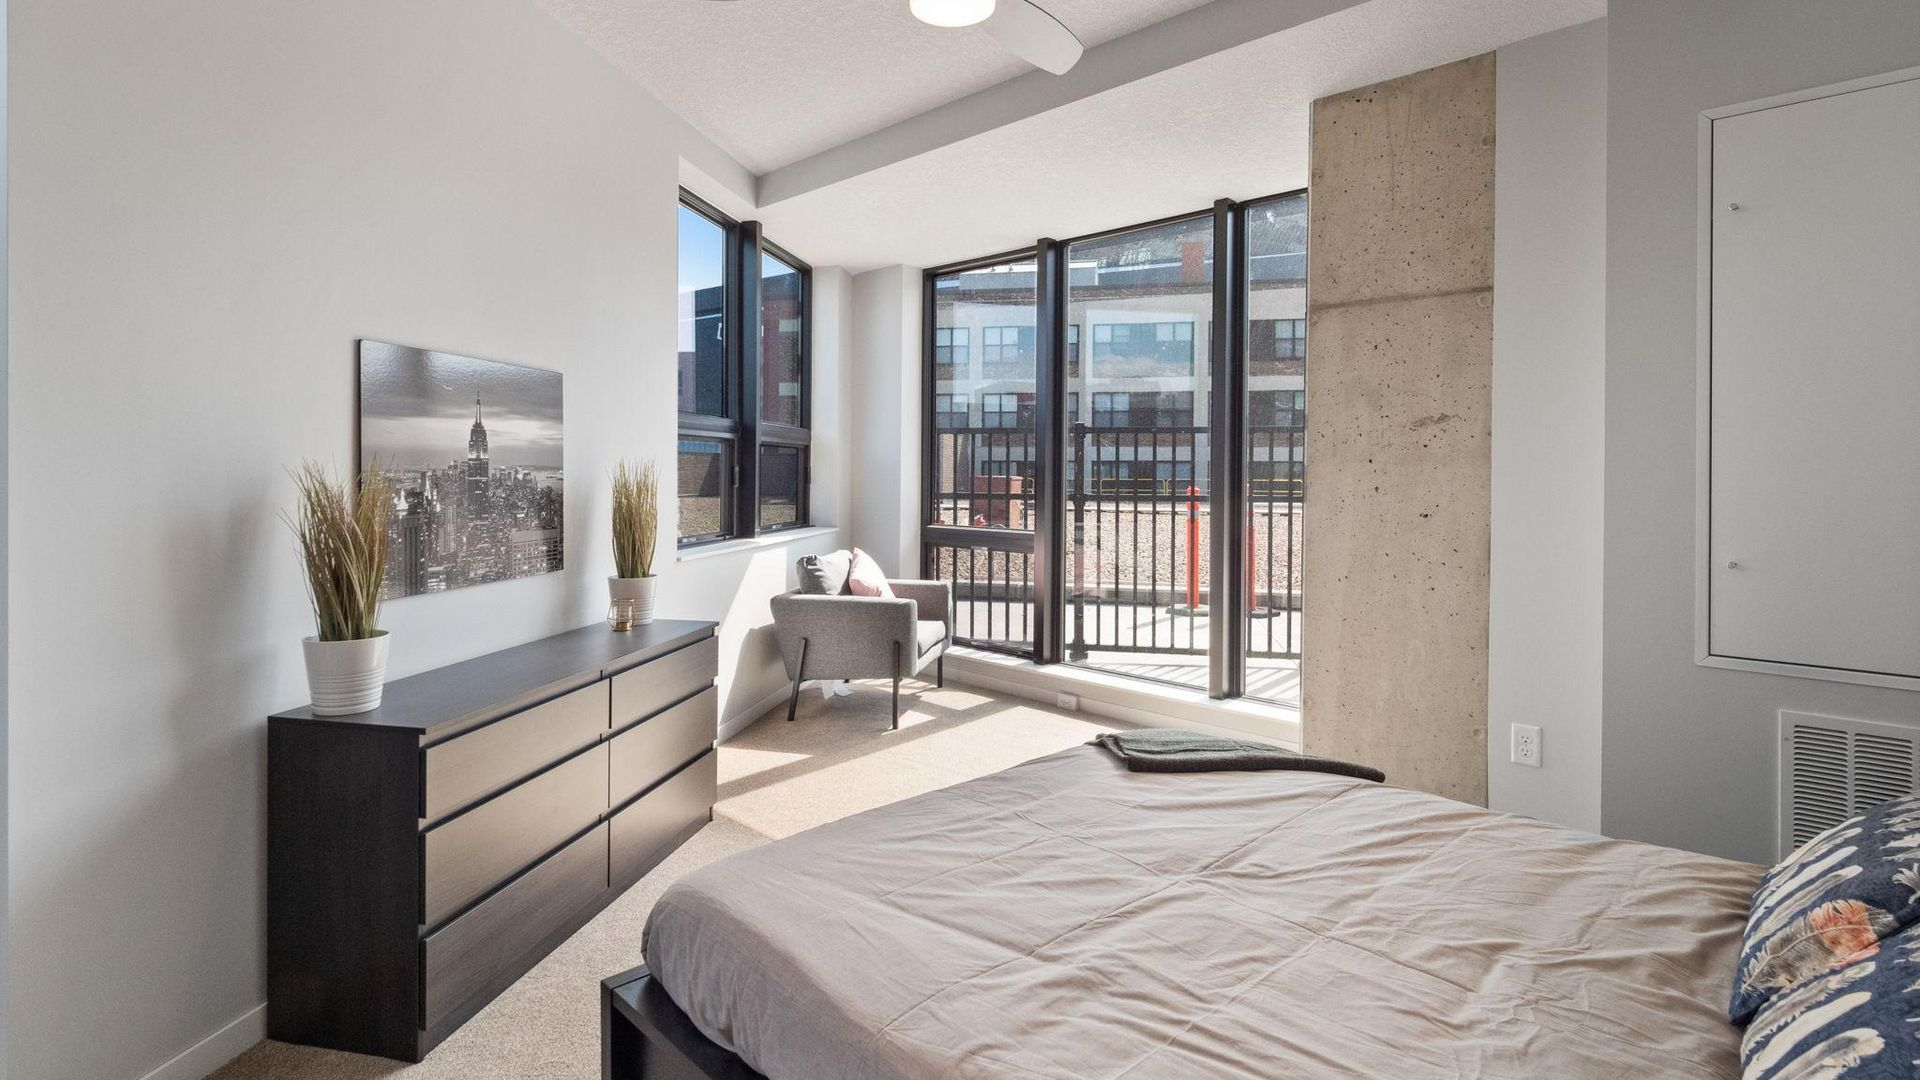 1 bedroom apartment at 811 washington avenue south